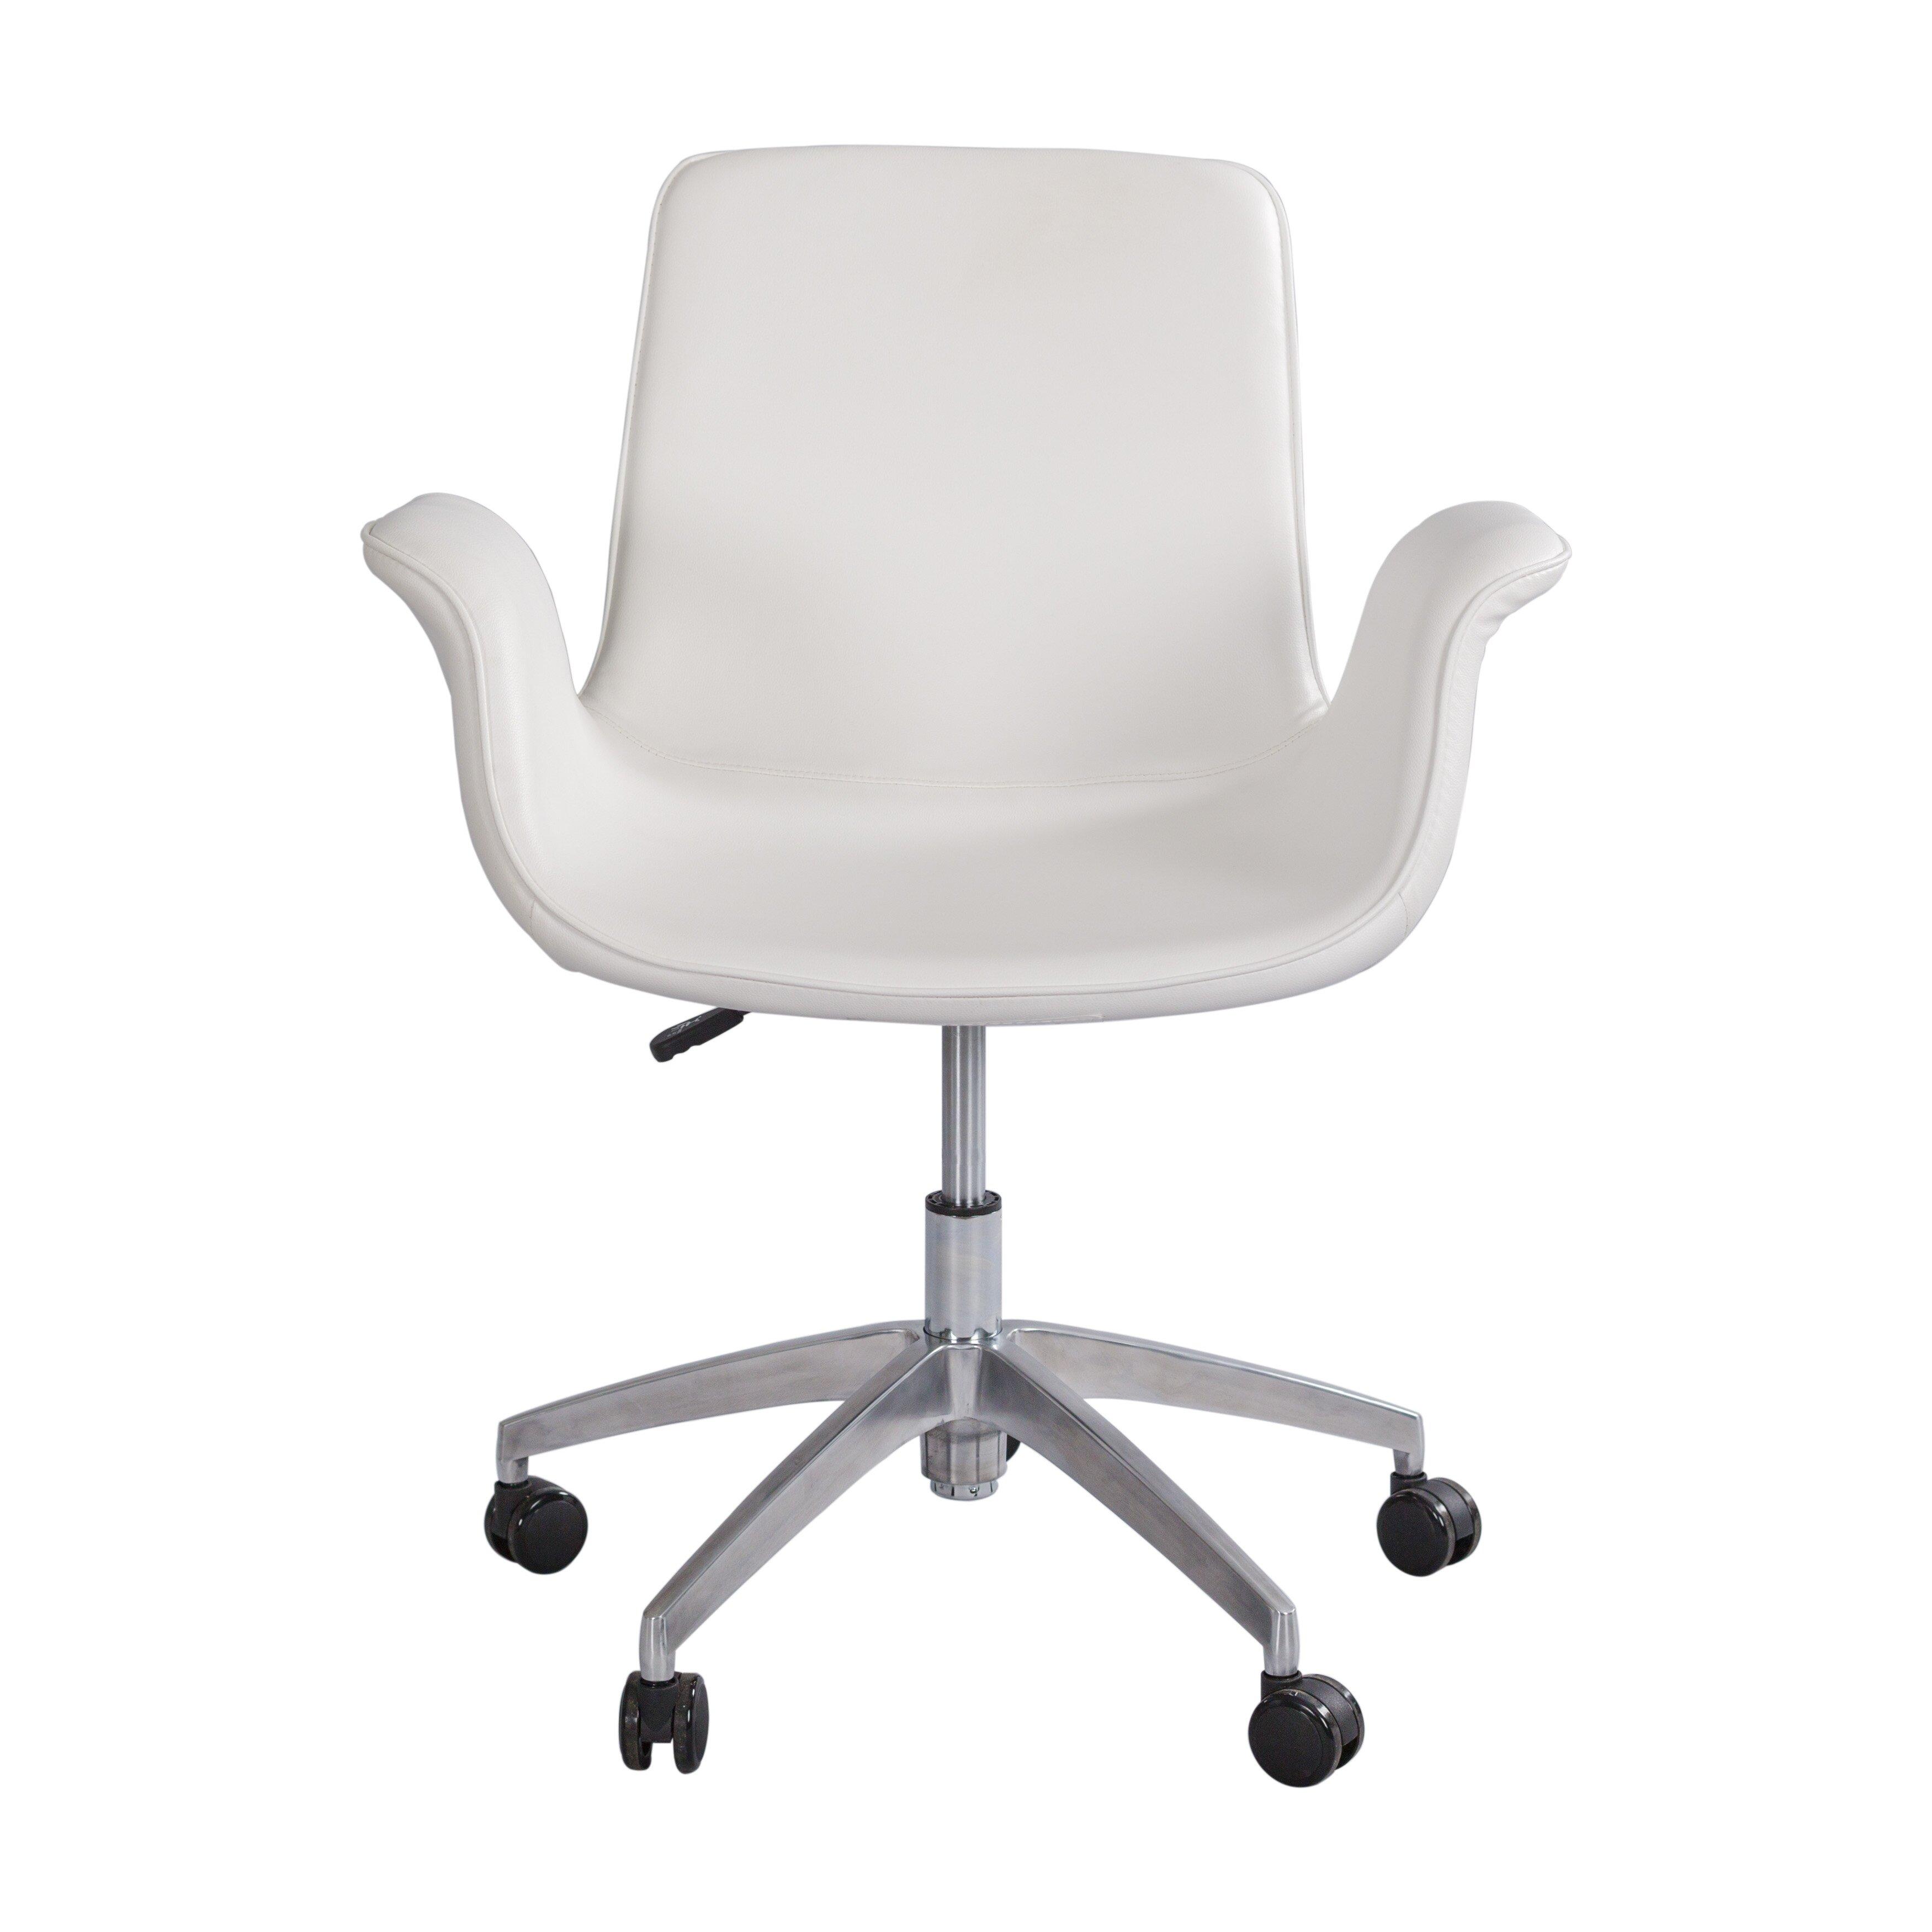 Matrix Jobb Mid Back Swivel Office Chair Reviews Wayfair